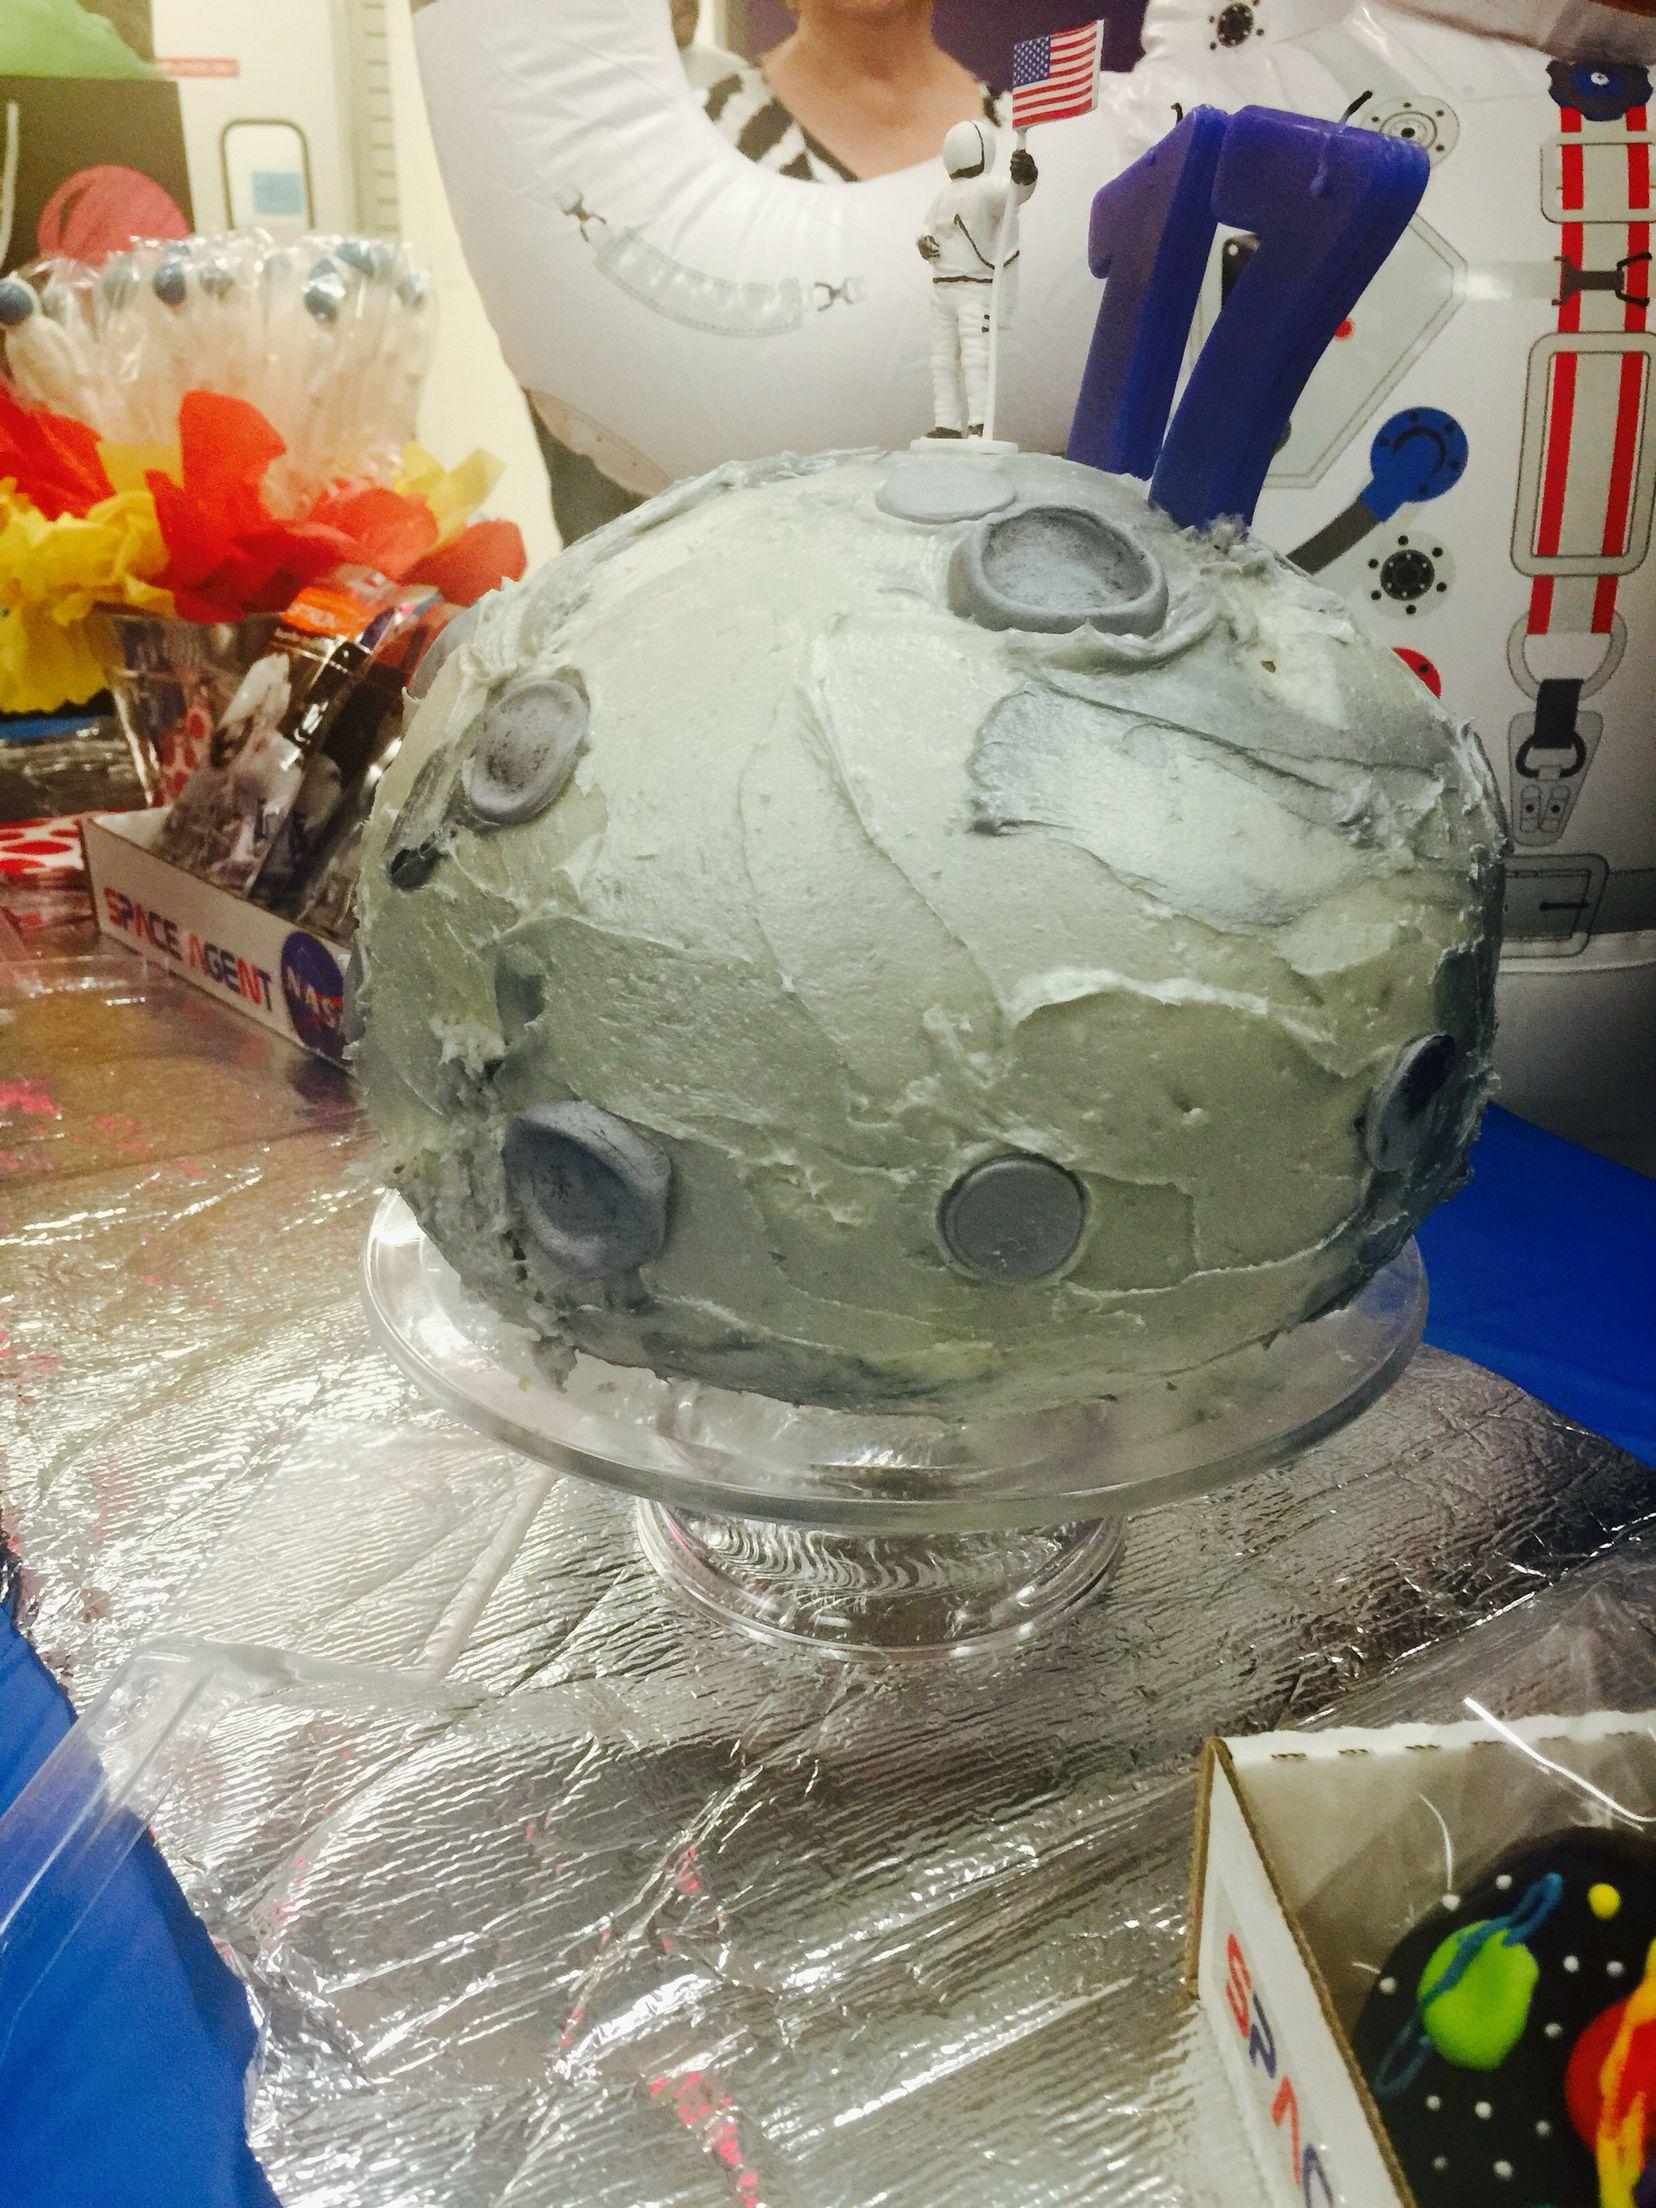 NASA THEME - Moon cake - sphere cake pan - white chocolate buttercream frosting , fondant and edible glitter spray